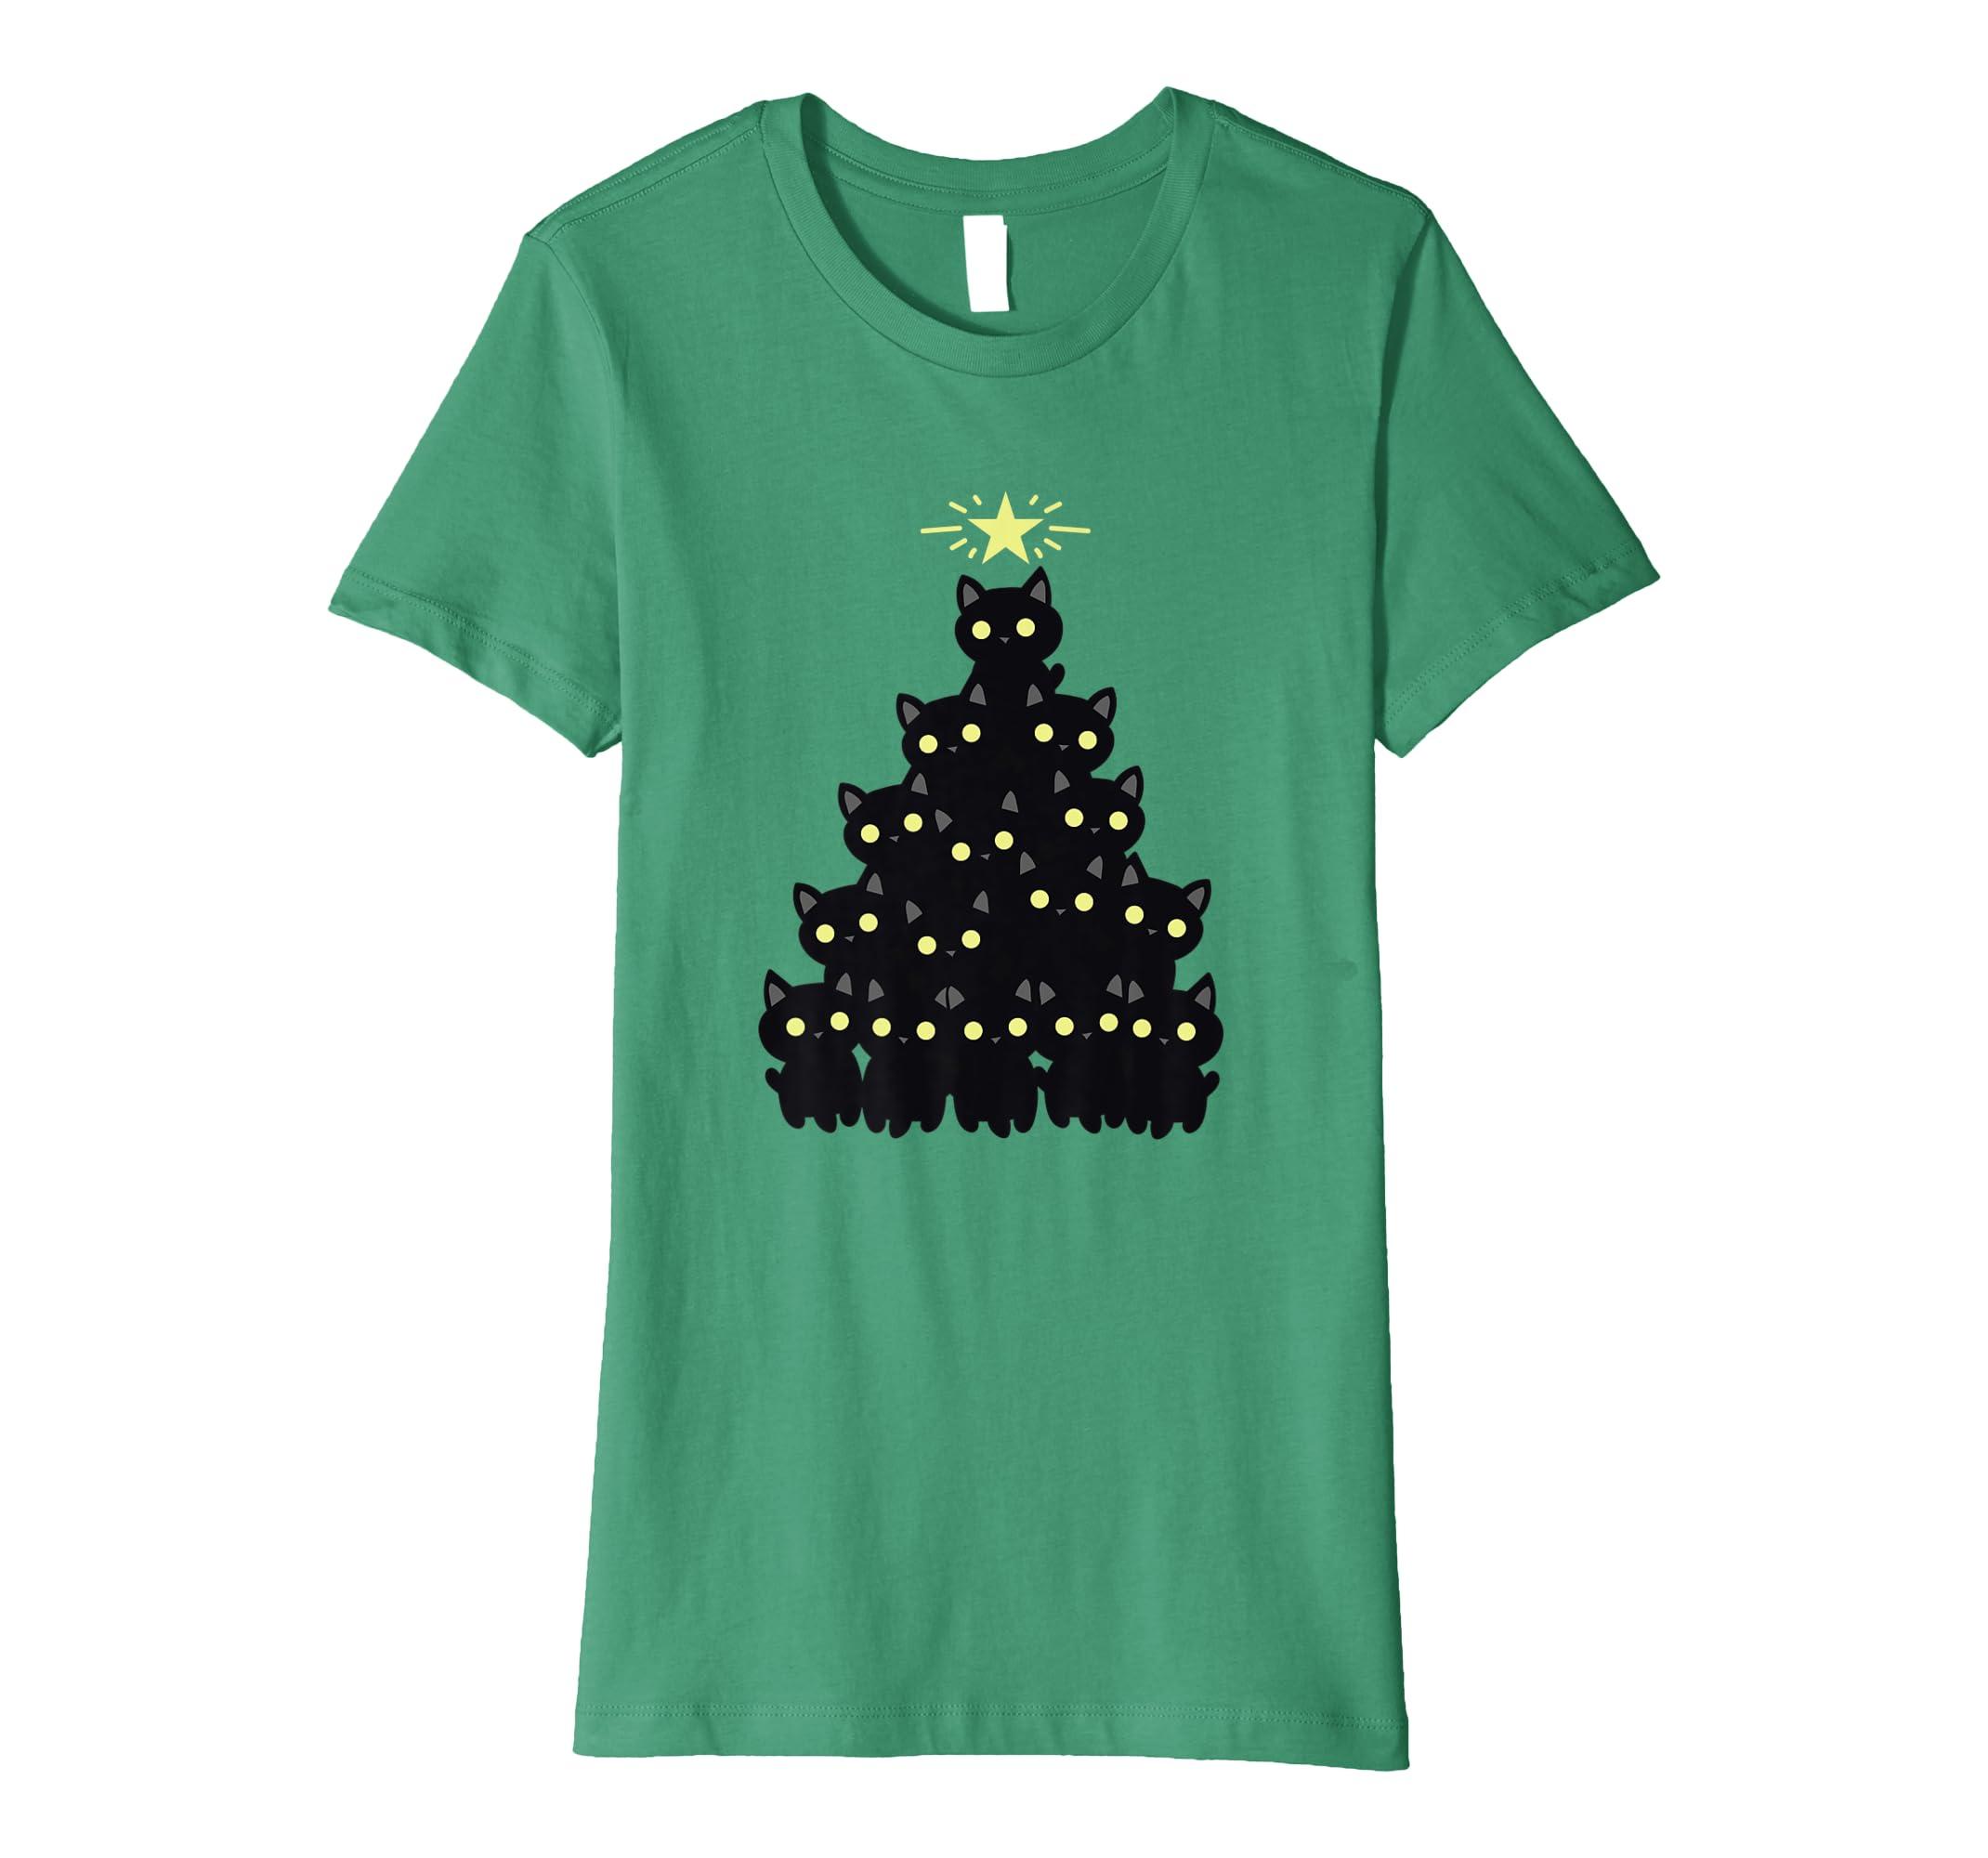 8ba21fd5 Amazon.com: Merry Catmas Christmas Black Cat Funny Holiday T-Shirt: Clothing